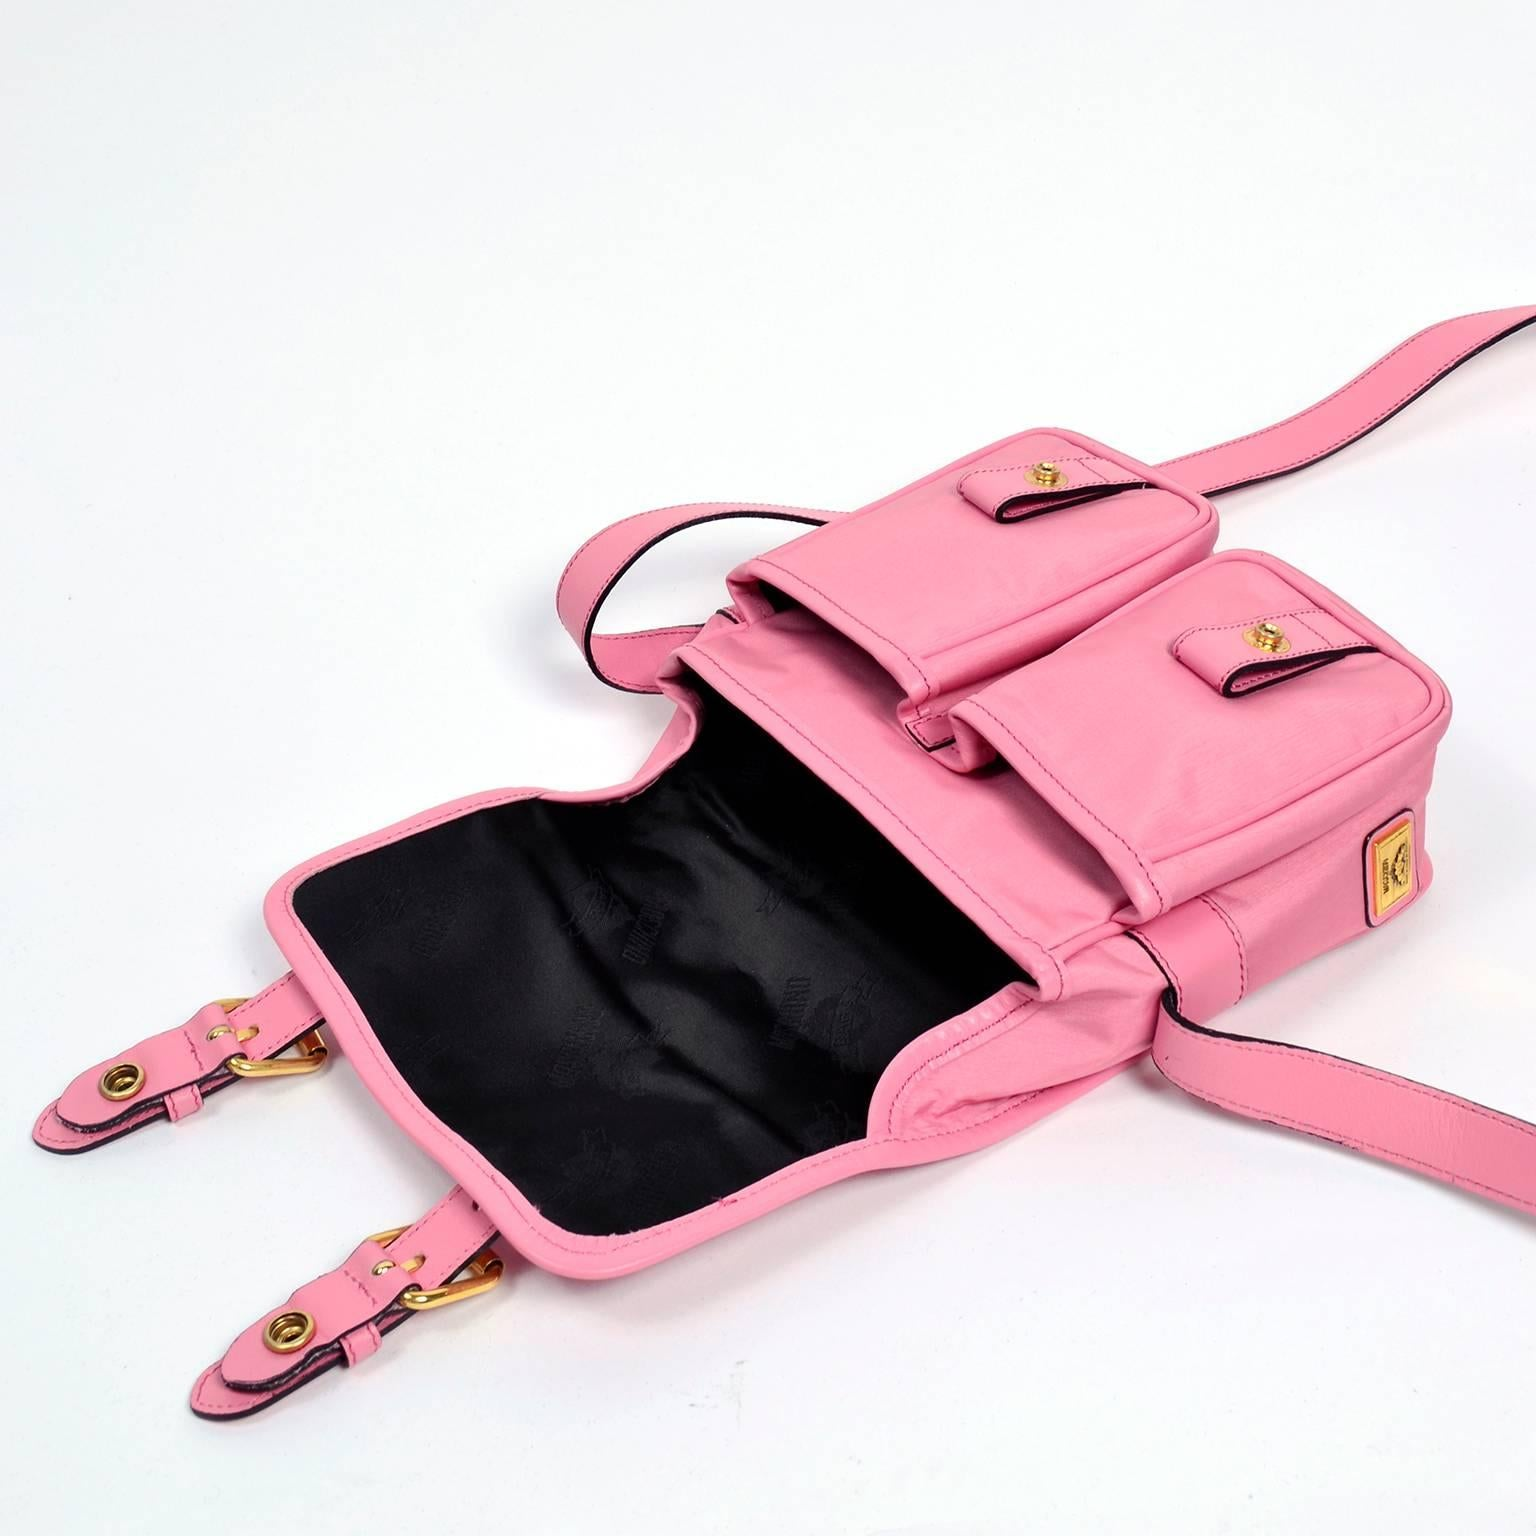 Moschino Redwall Vintage Pink Handbag School Buckle Satchel Style Bag Et3JUqdSd